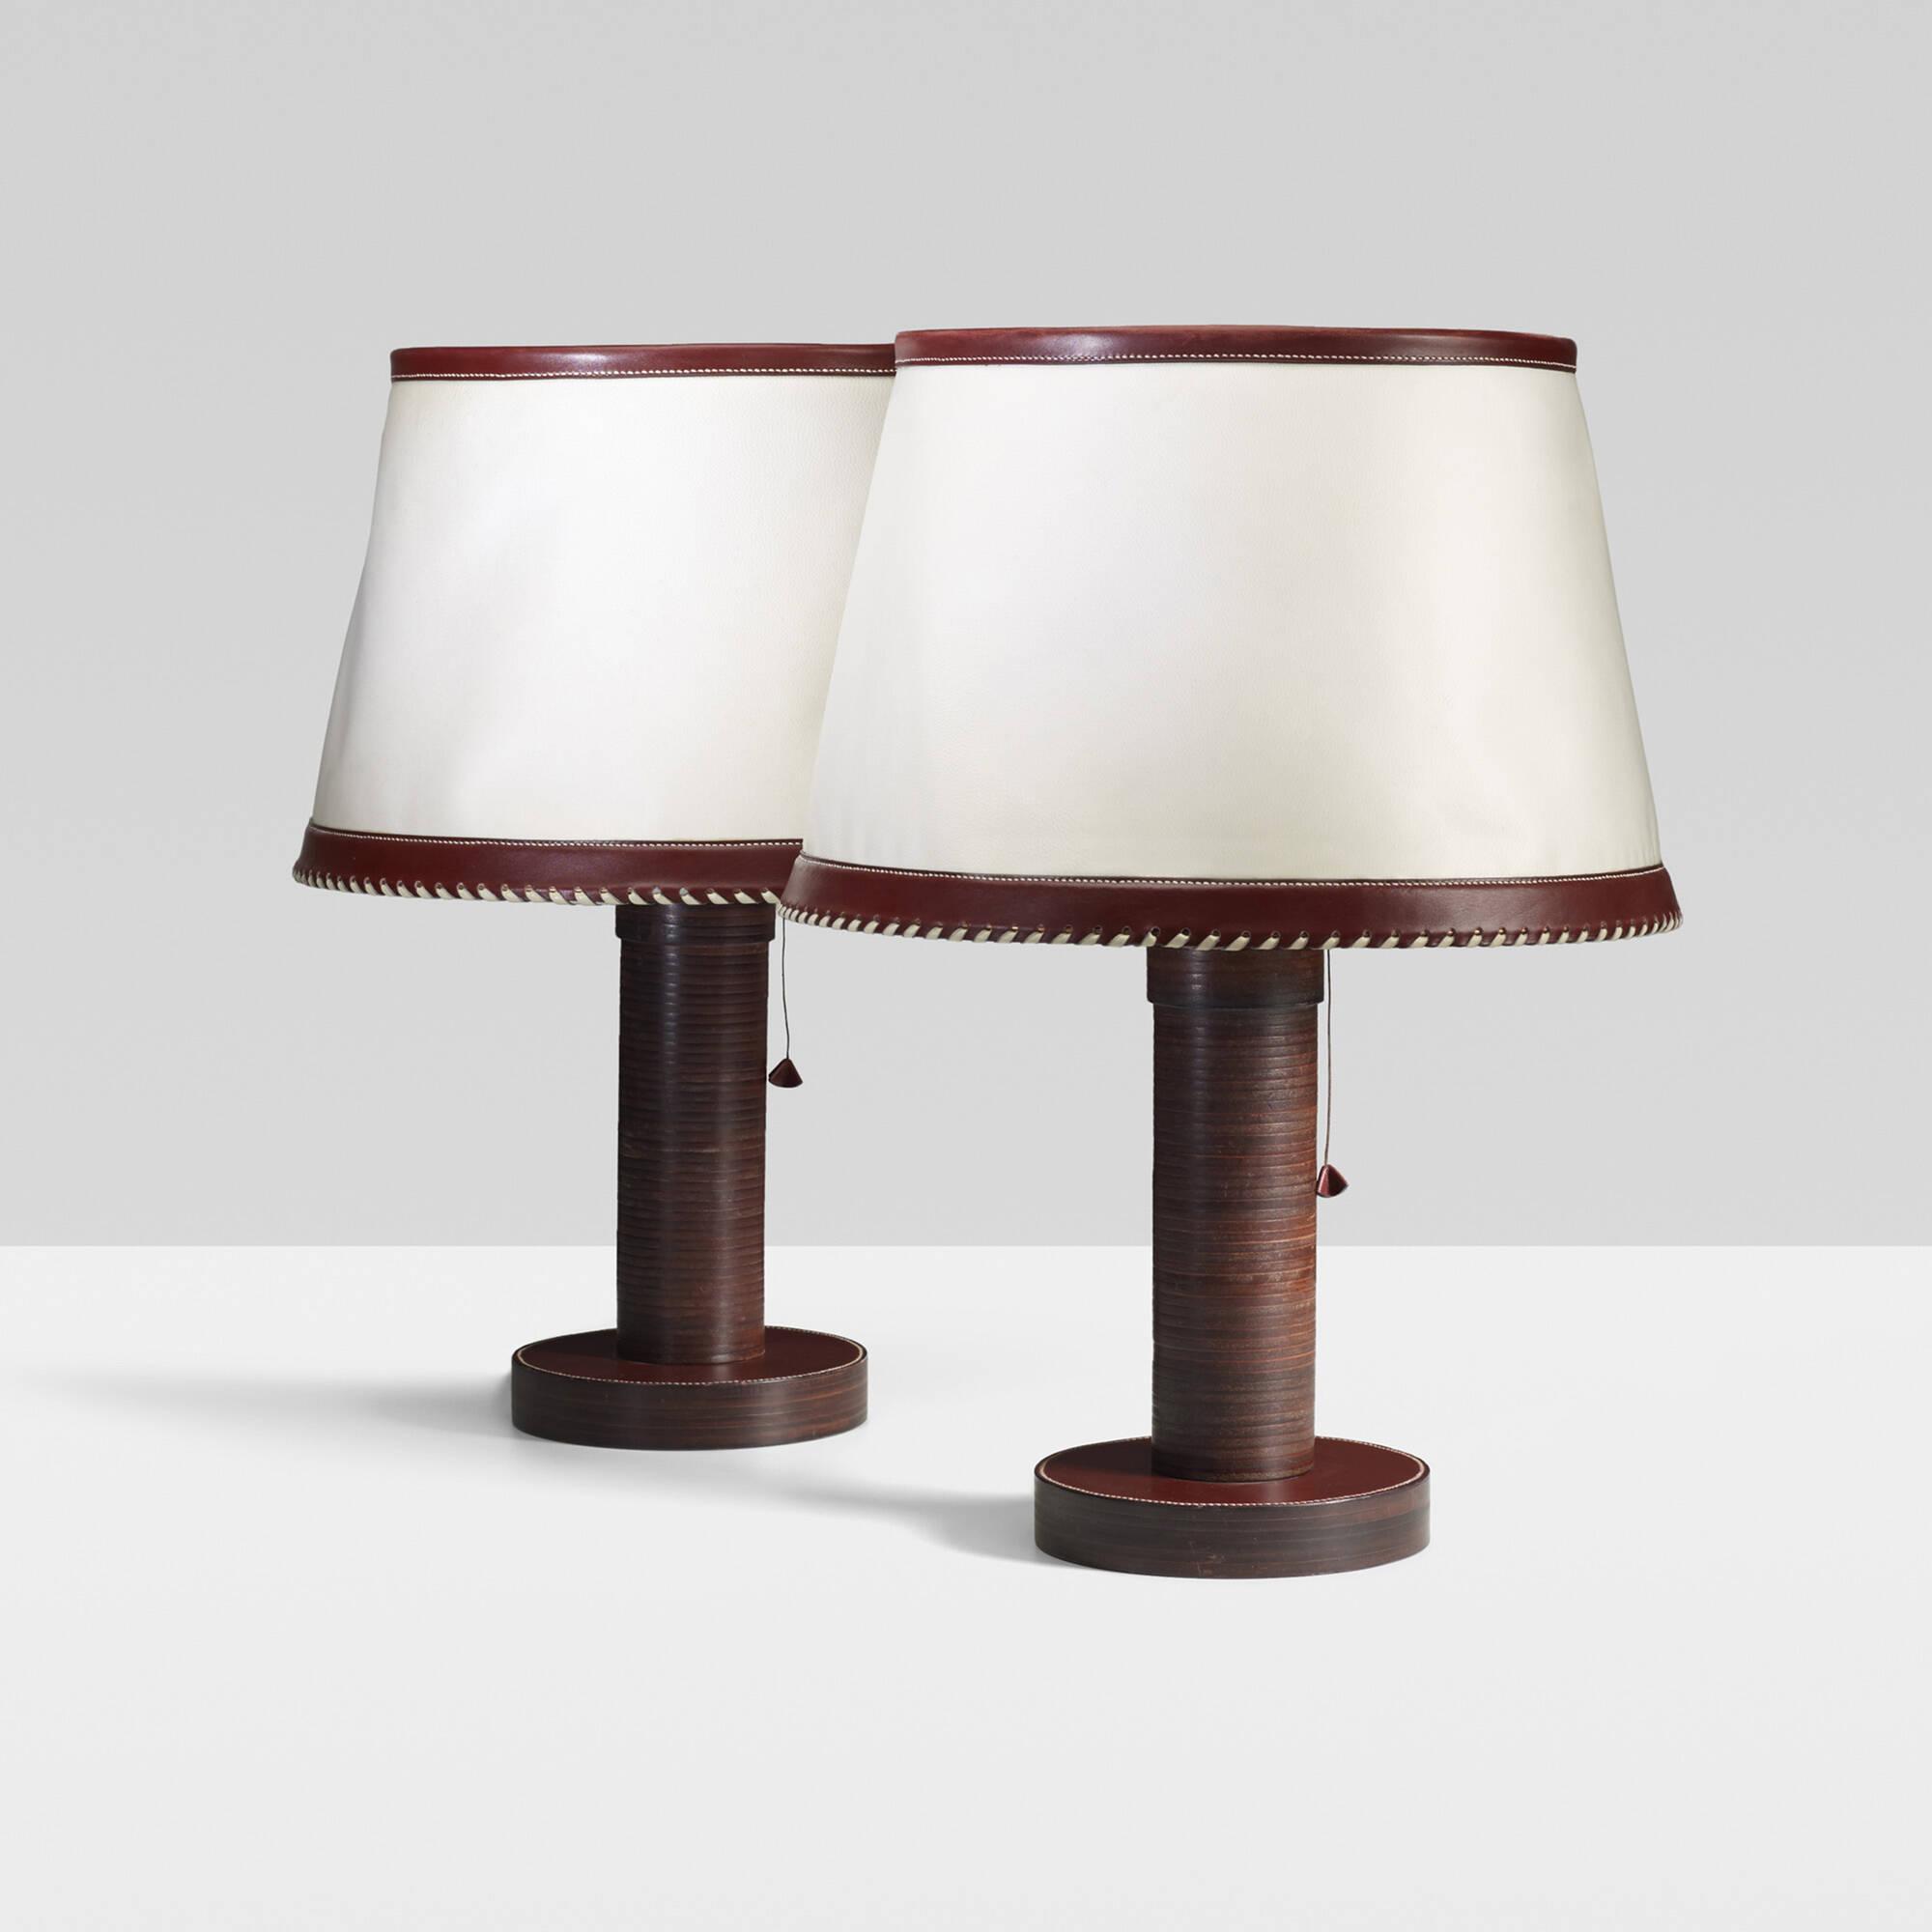 Peachy 284 Paul Dupre Lafon Table Lamps Pair Important Design Interior Design Ideas Inesswwsoteloinfo